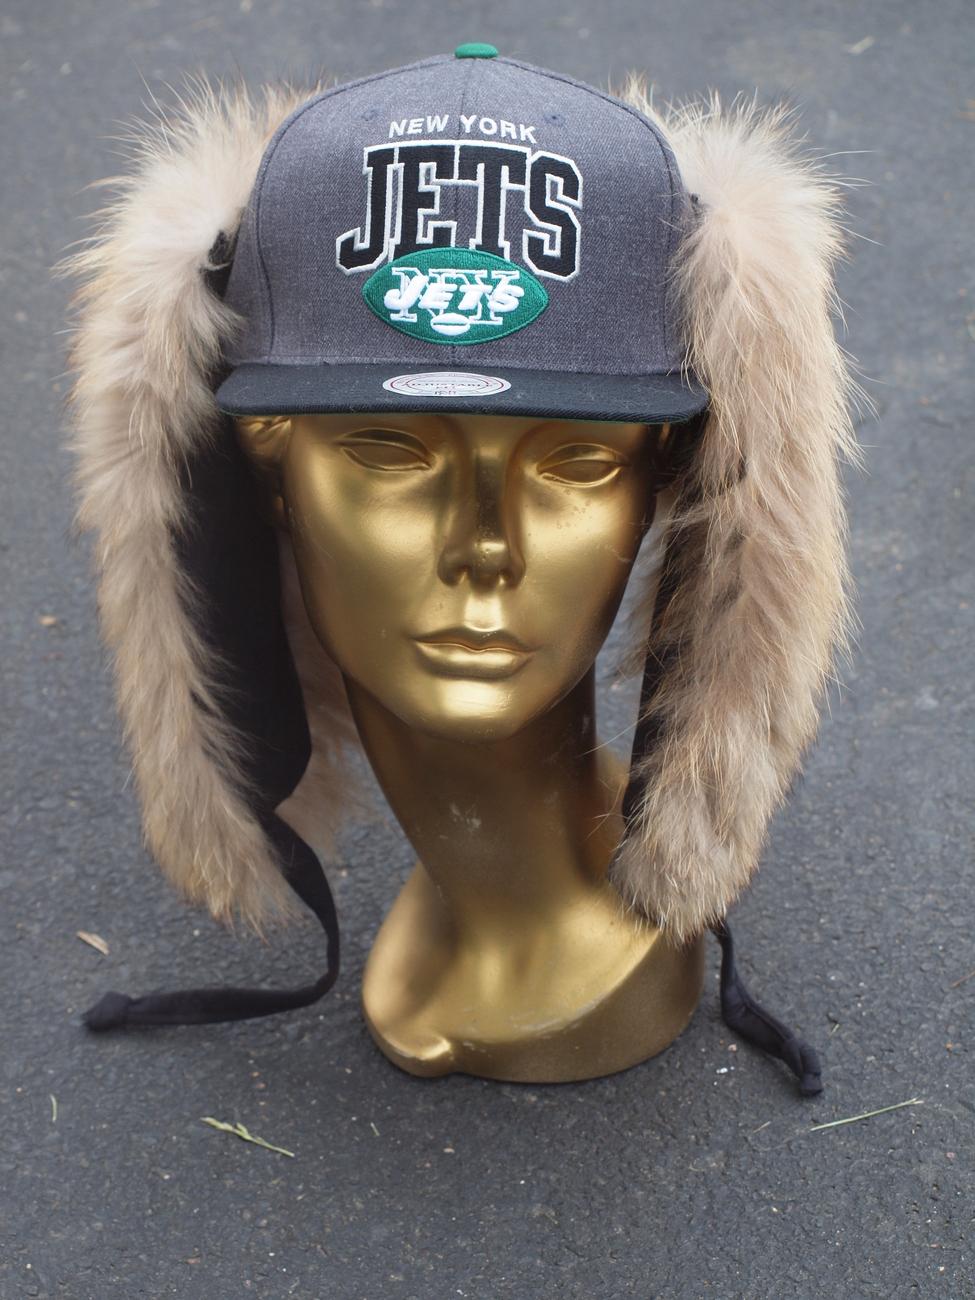 NFL MITCHELL & NESS NEW YORK JETS CUSTOM FUR HAT